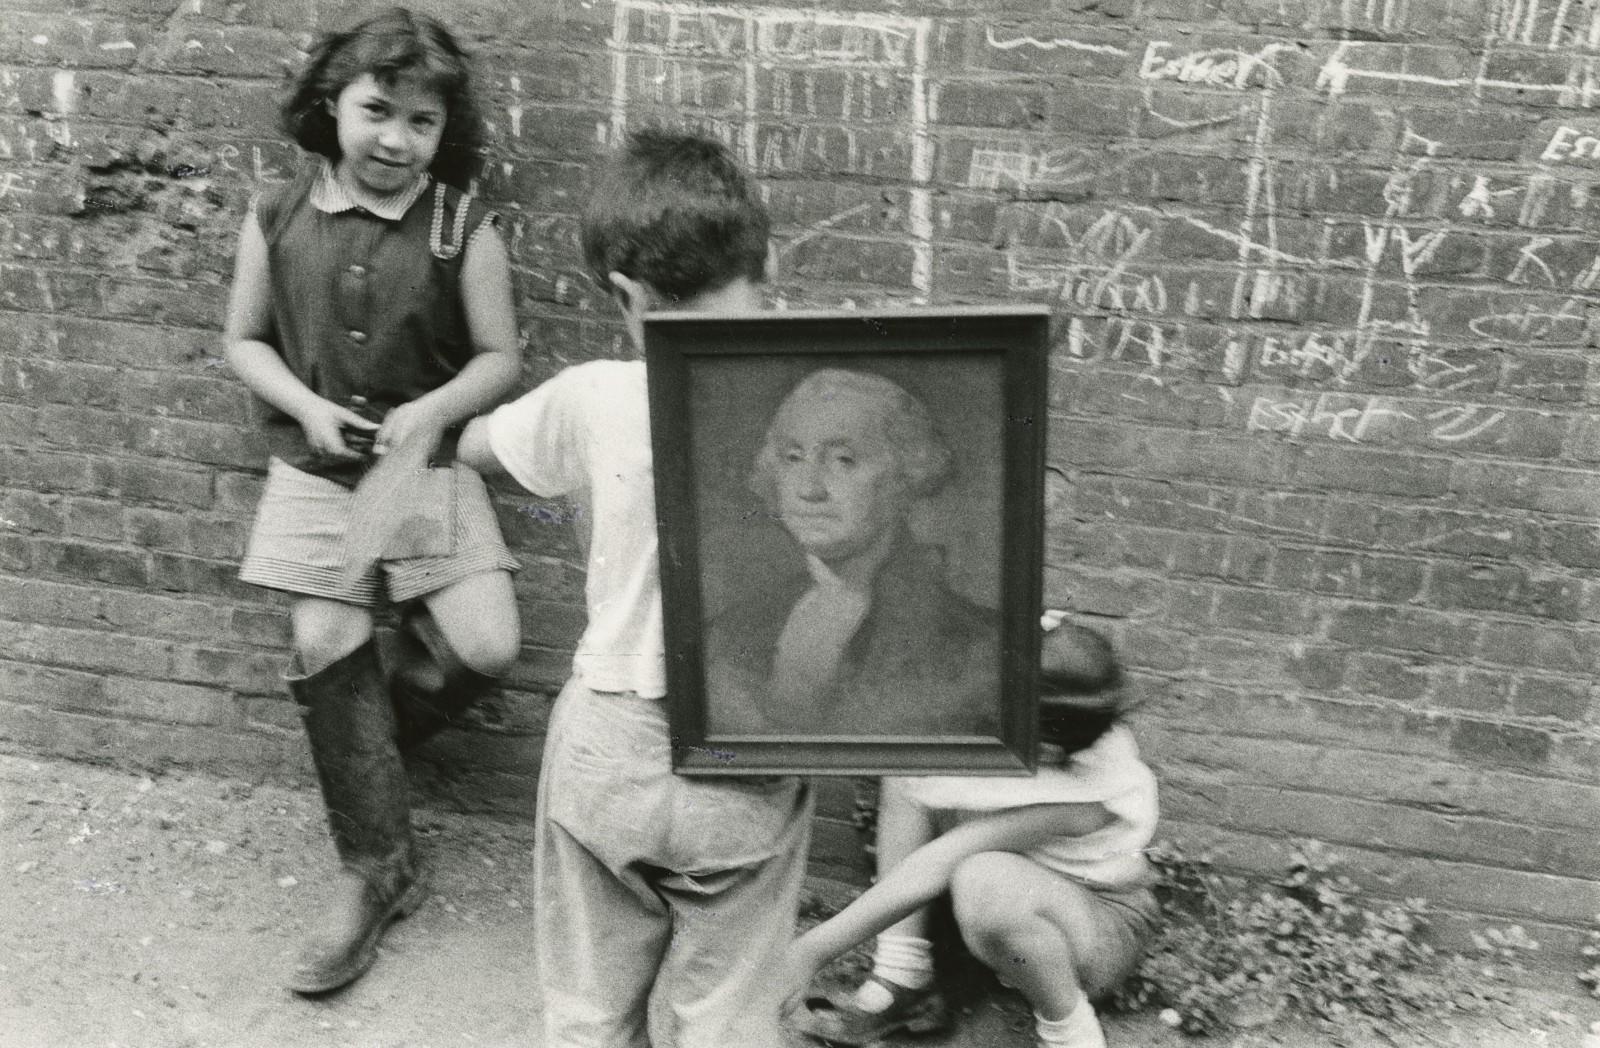 Robert Frank, New York City, 1950